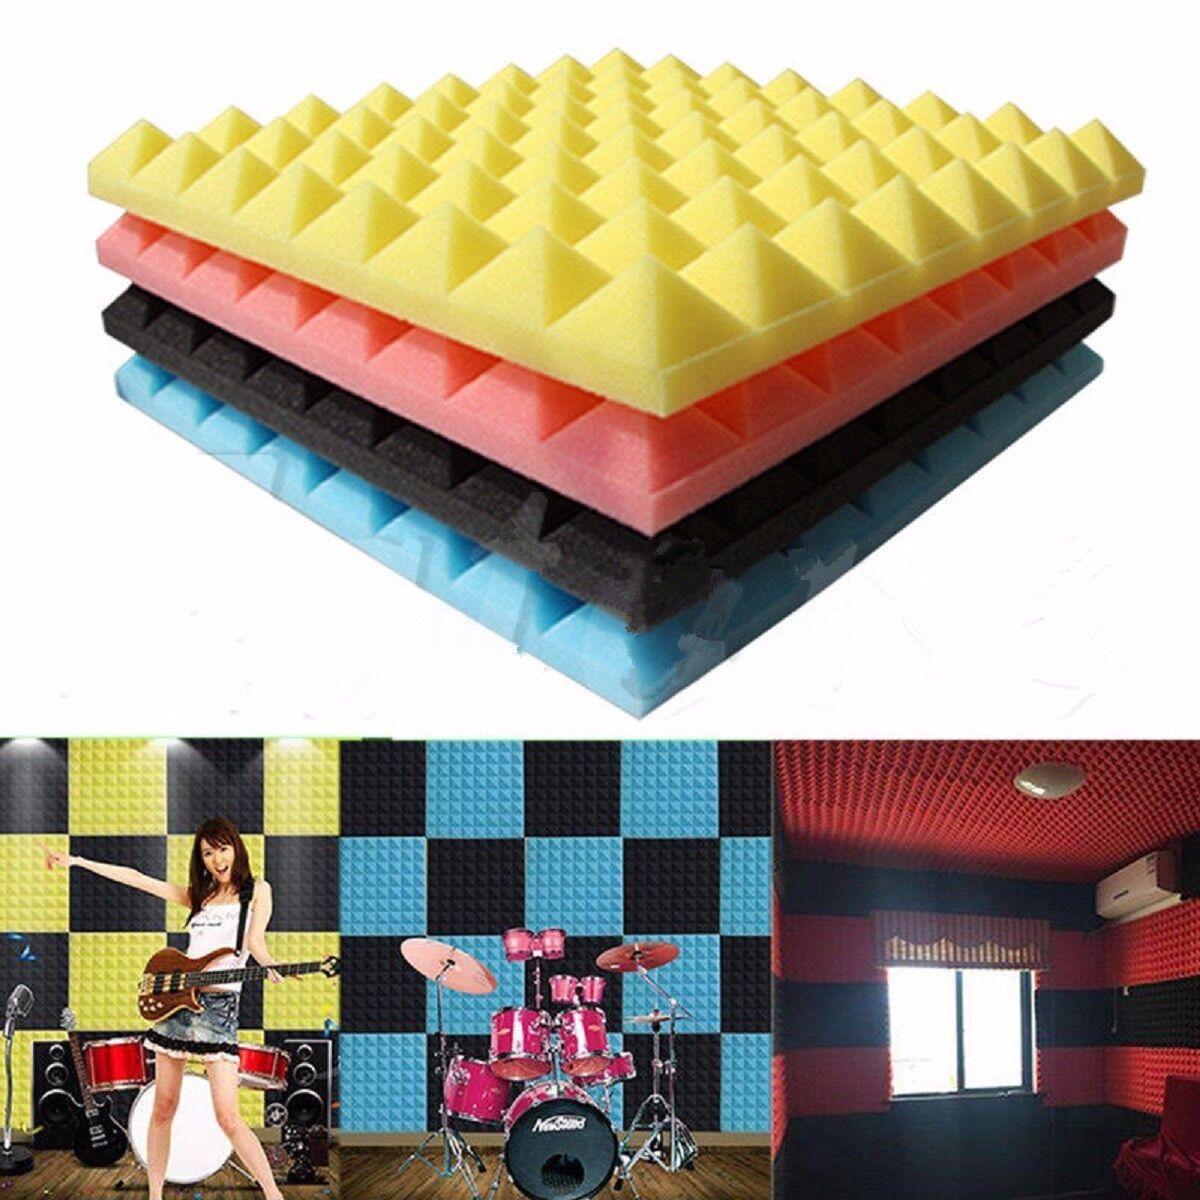 Acoustic Panels Tiles Sound Proof Absorption Flame Retardant PE Foam Room Decor 4